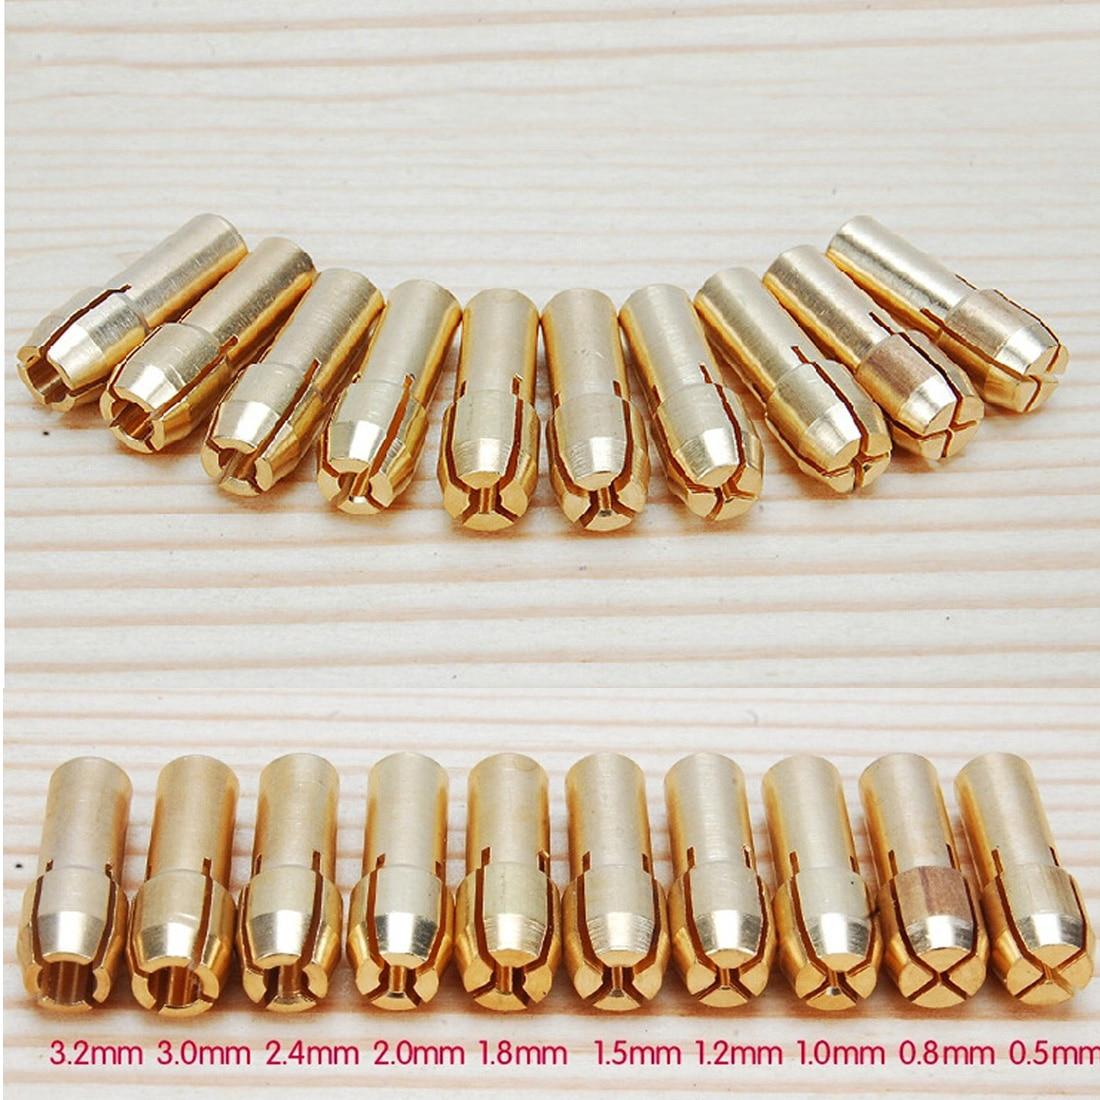 Drill Chuck Collet Bits 0.5-3.2mm 10pcs/set Brass 4.3mm Shank For Dremel Rotary Tool Golden